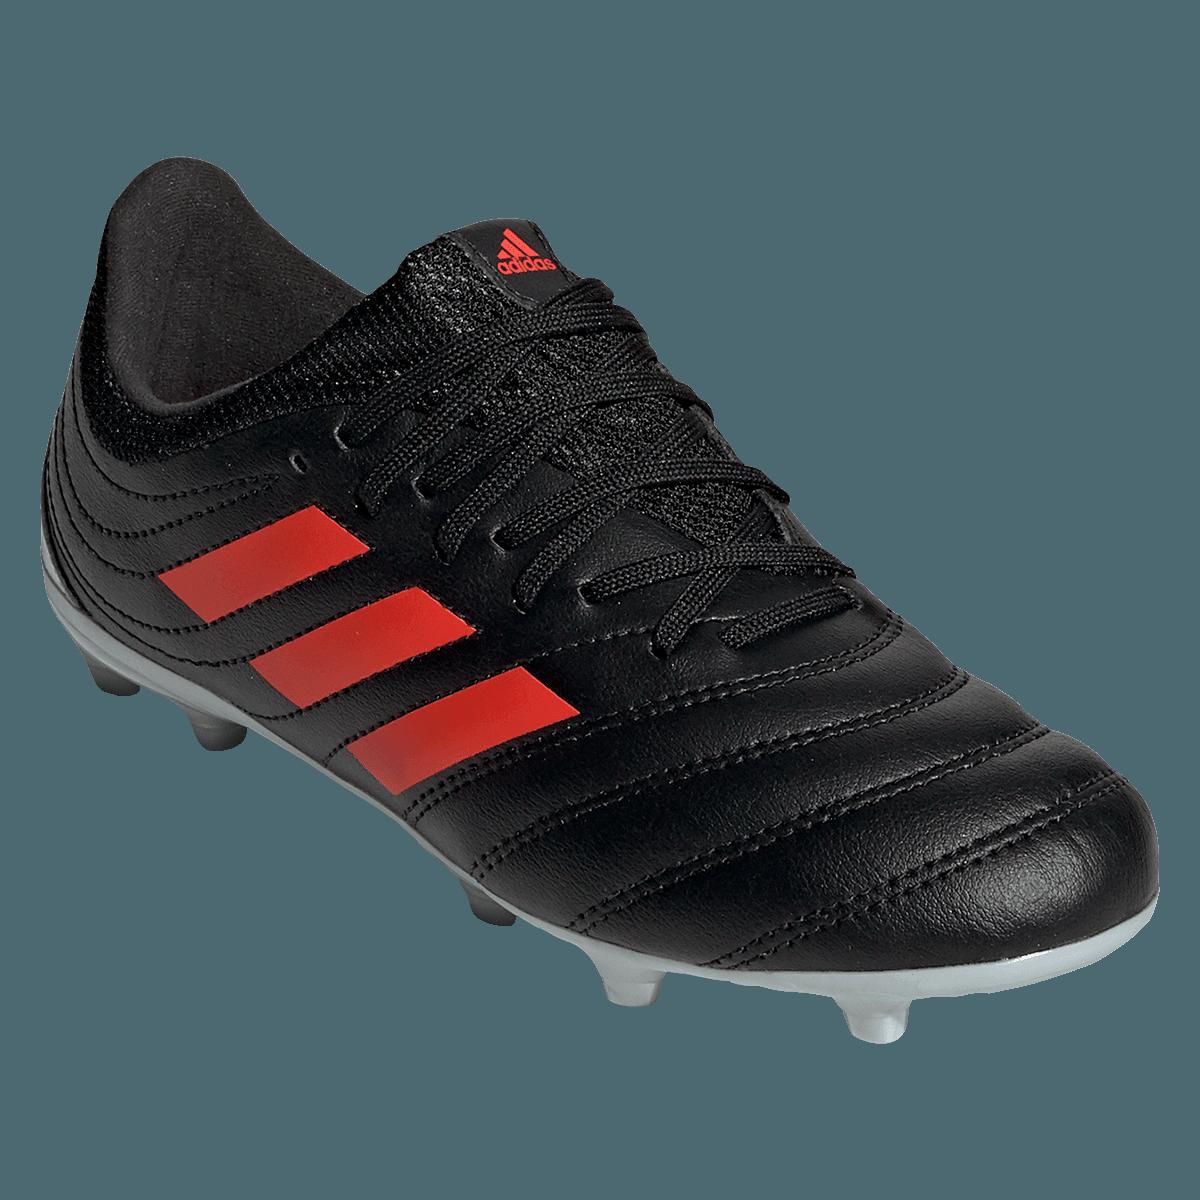 Adidas Kinder Fussballschuh Copa 19 3 Fg J Schwarz Rot